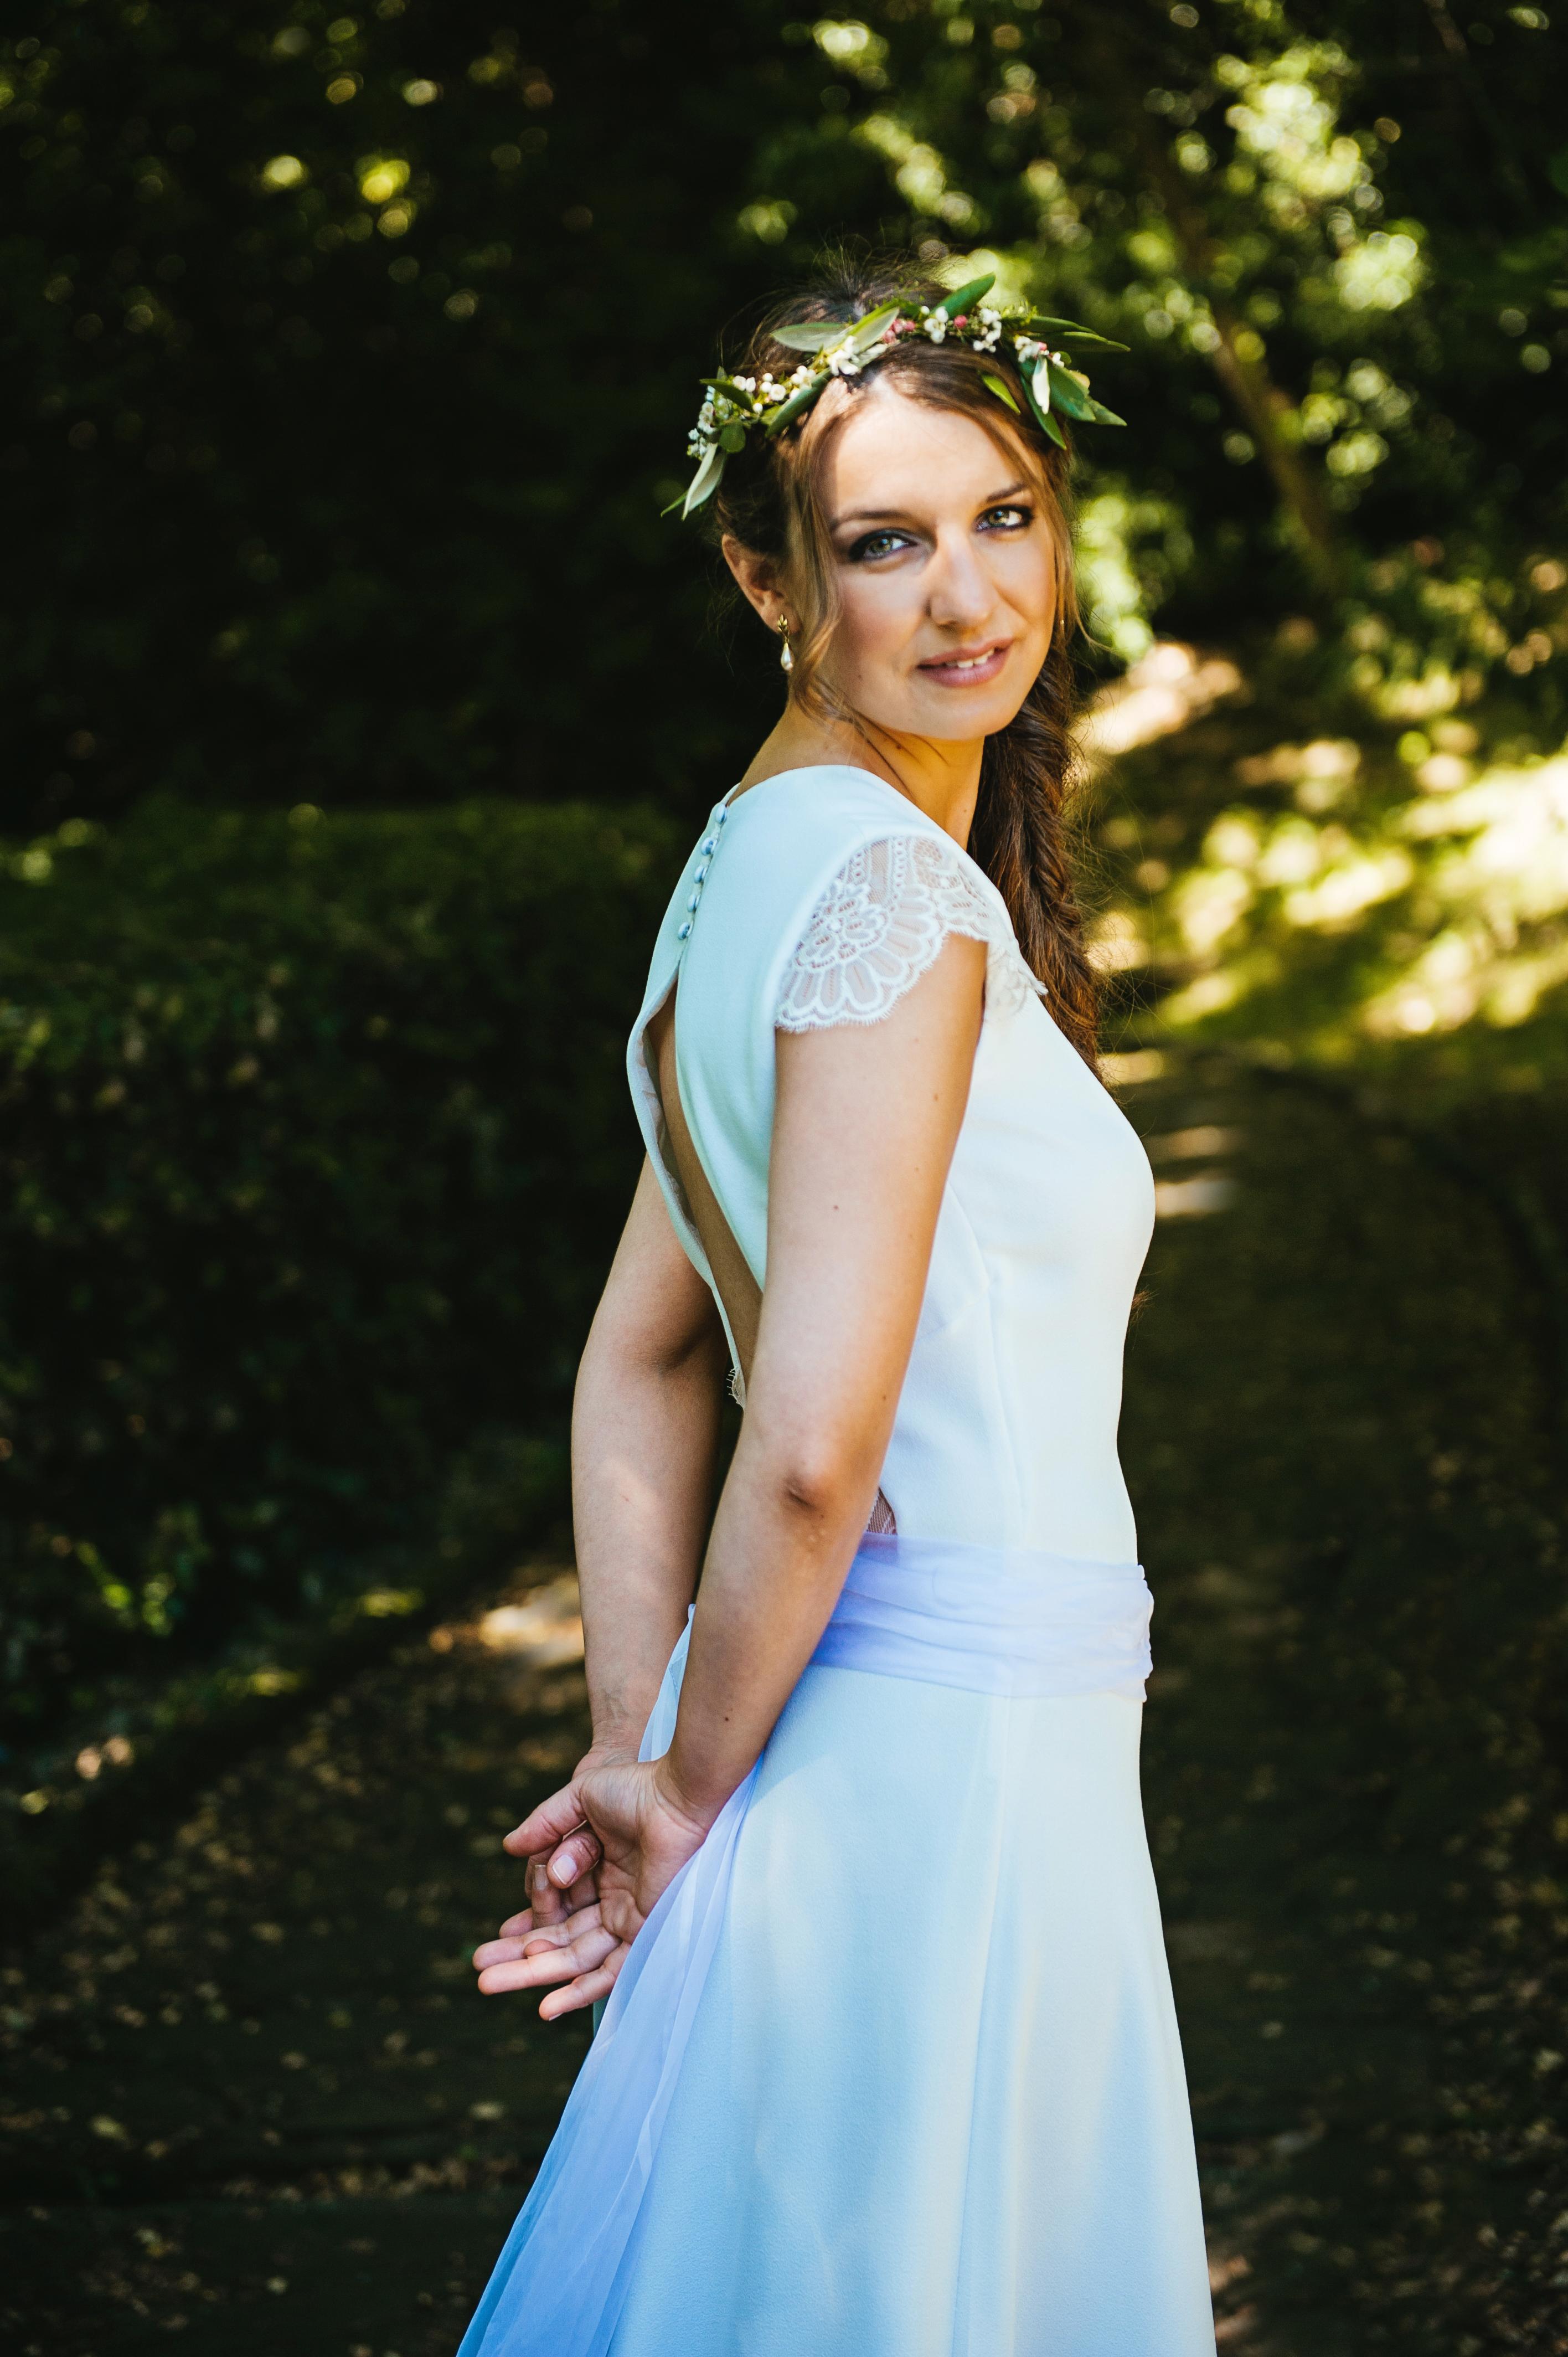 sesion-fotos-parejas-bodas-fotografo-reportaje-donosti-gipuzkoa-san-sebastian-preboda-meagas-getaria